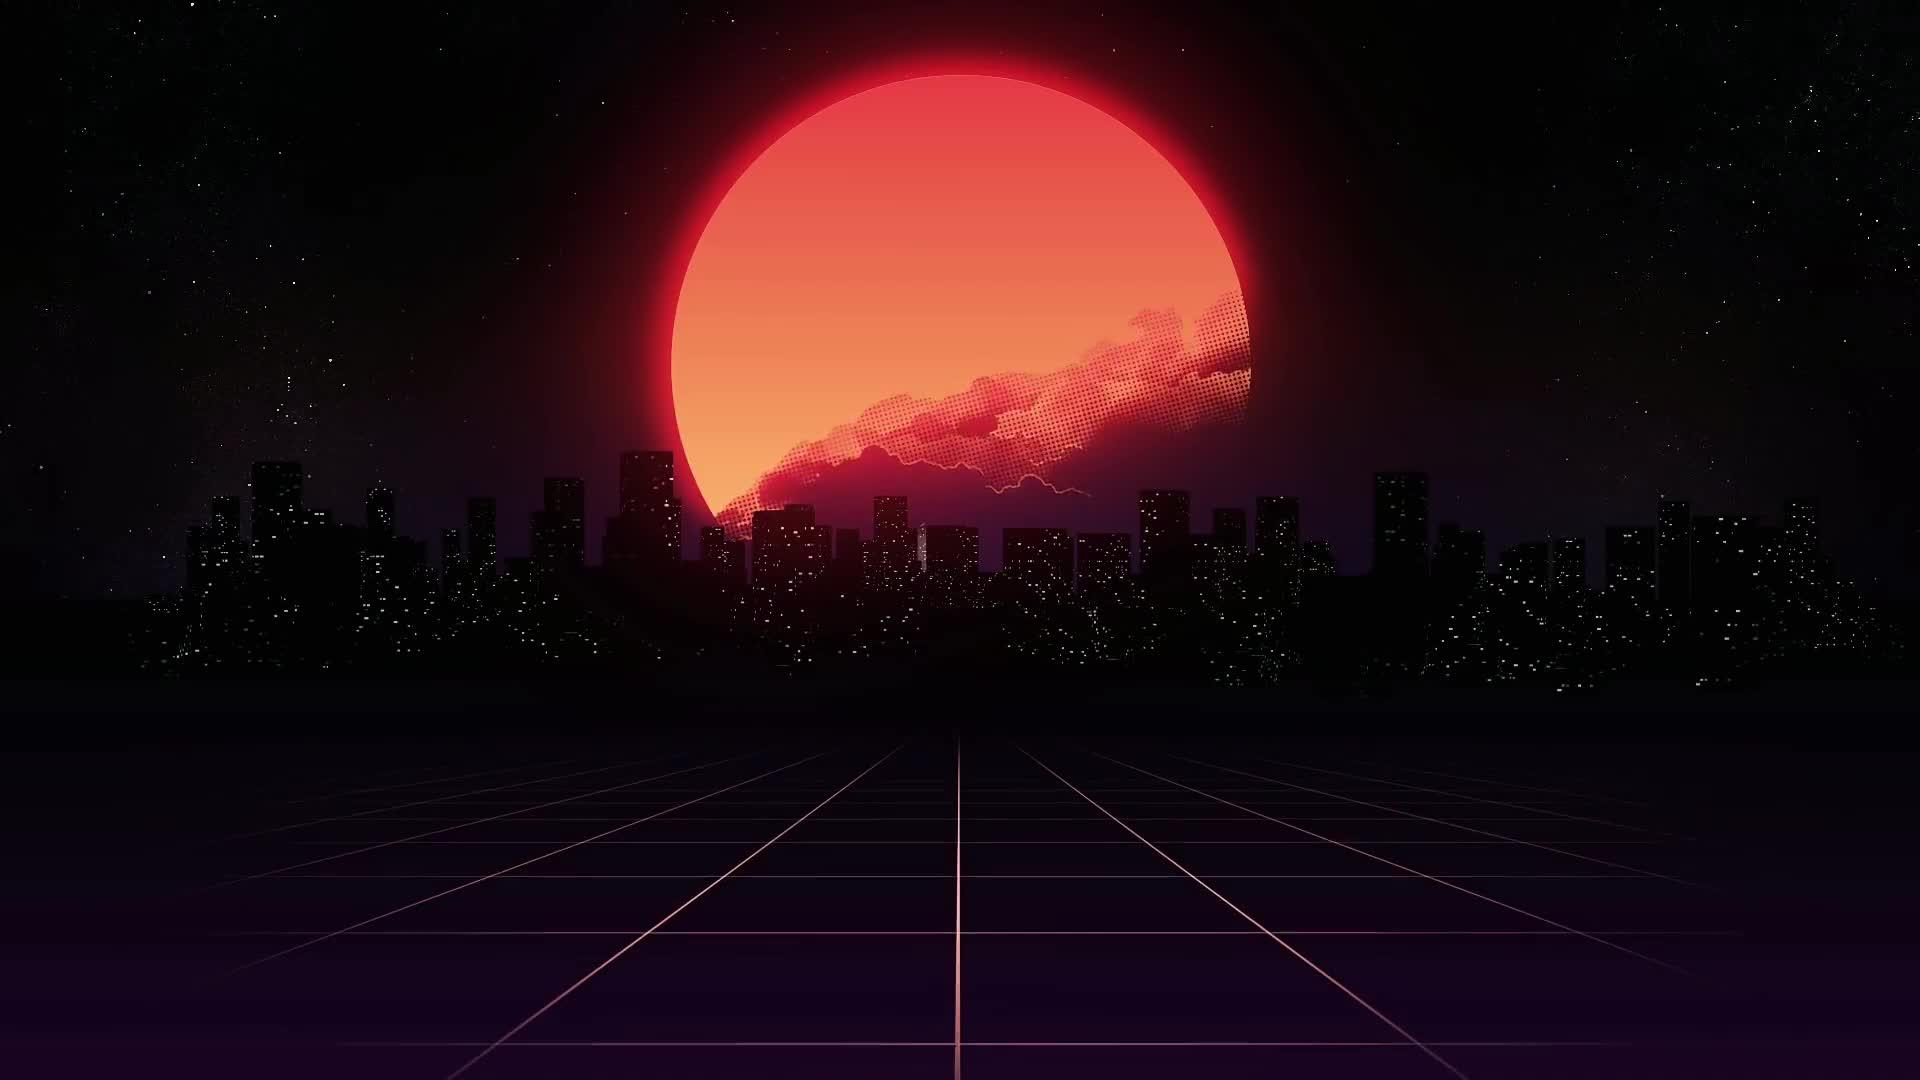 N I G H T D R I V E A Synthwave Music Video Mix Chillwave Retrowave